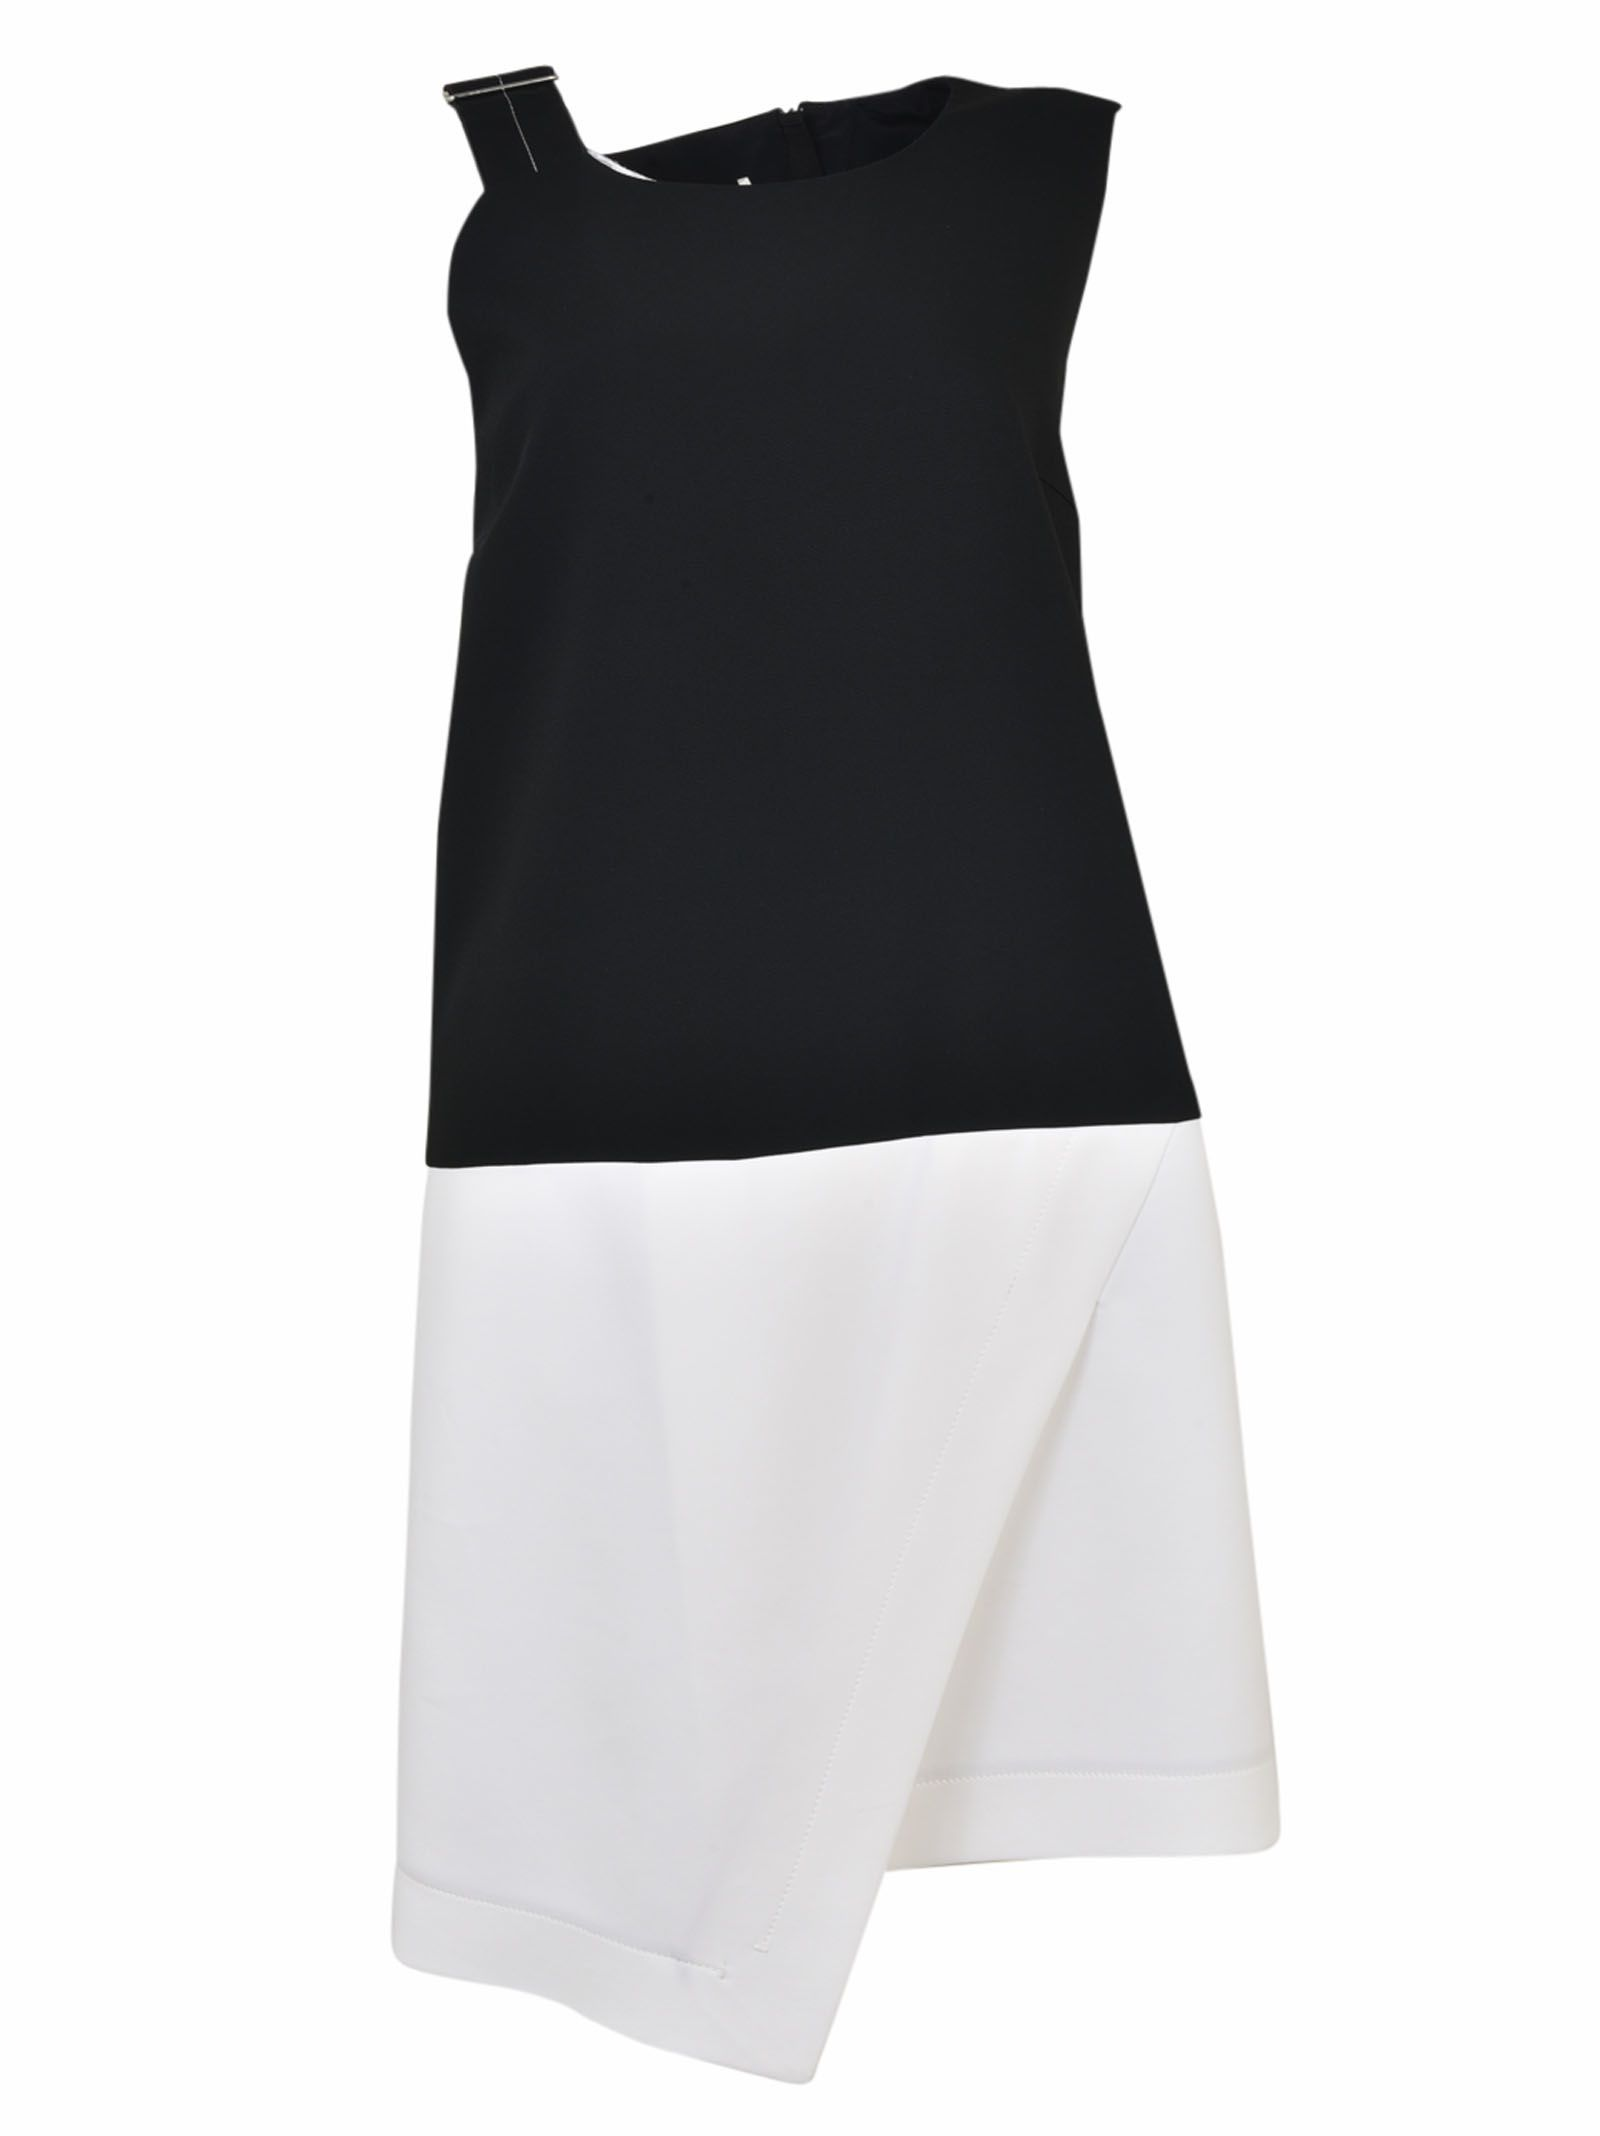 Navon n670 plus white dresses